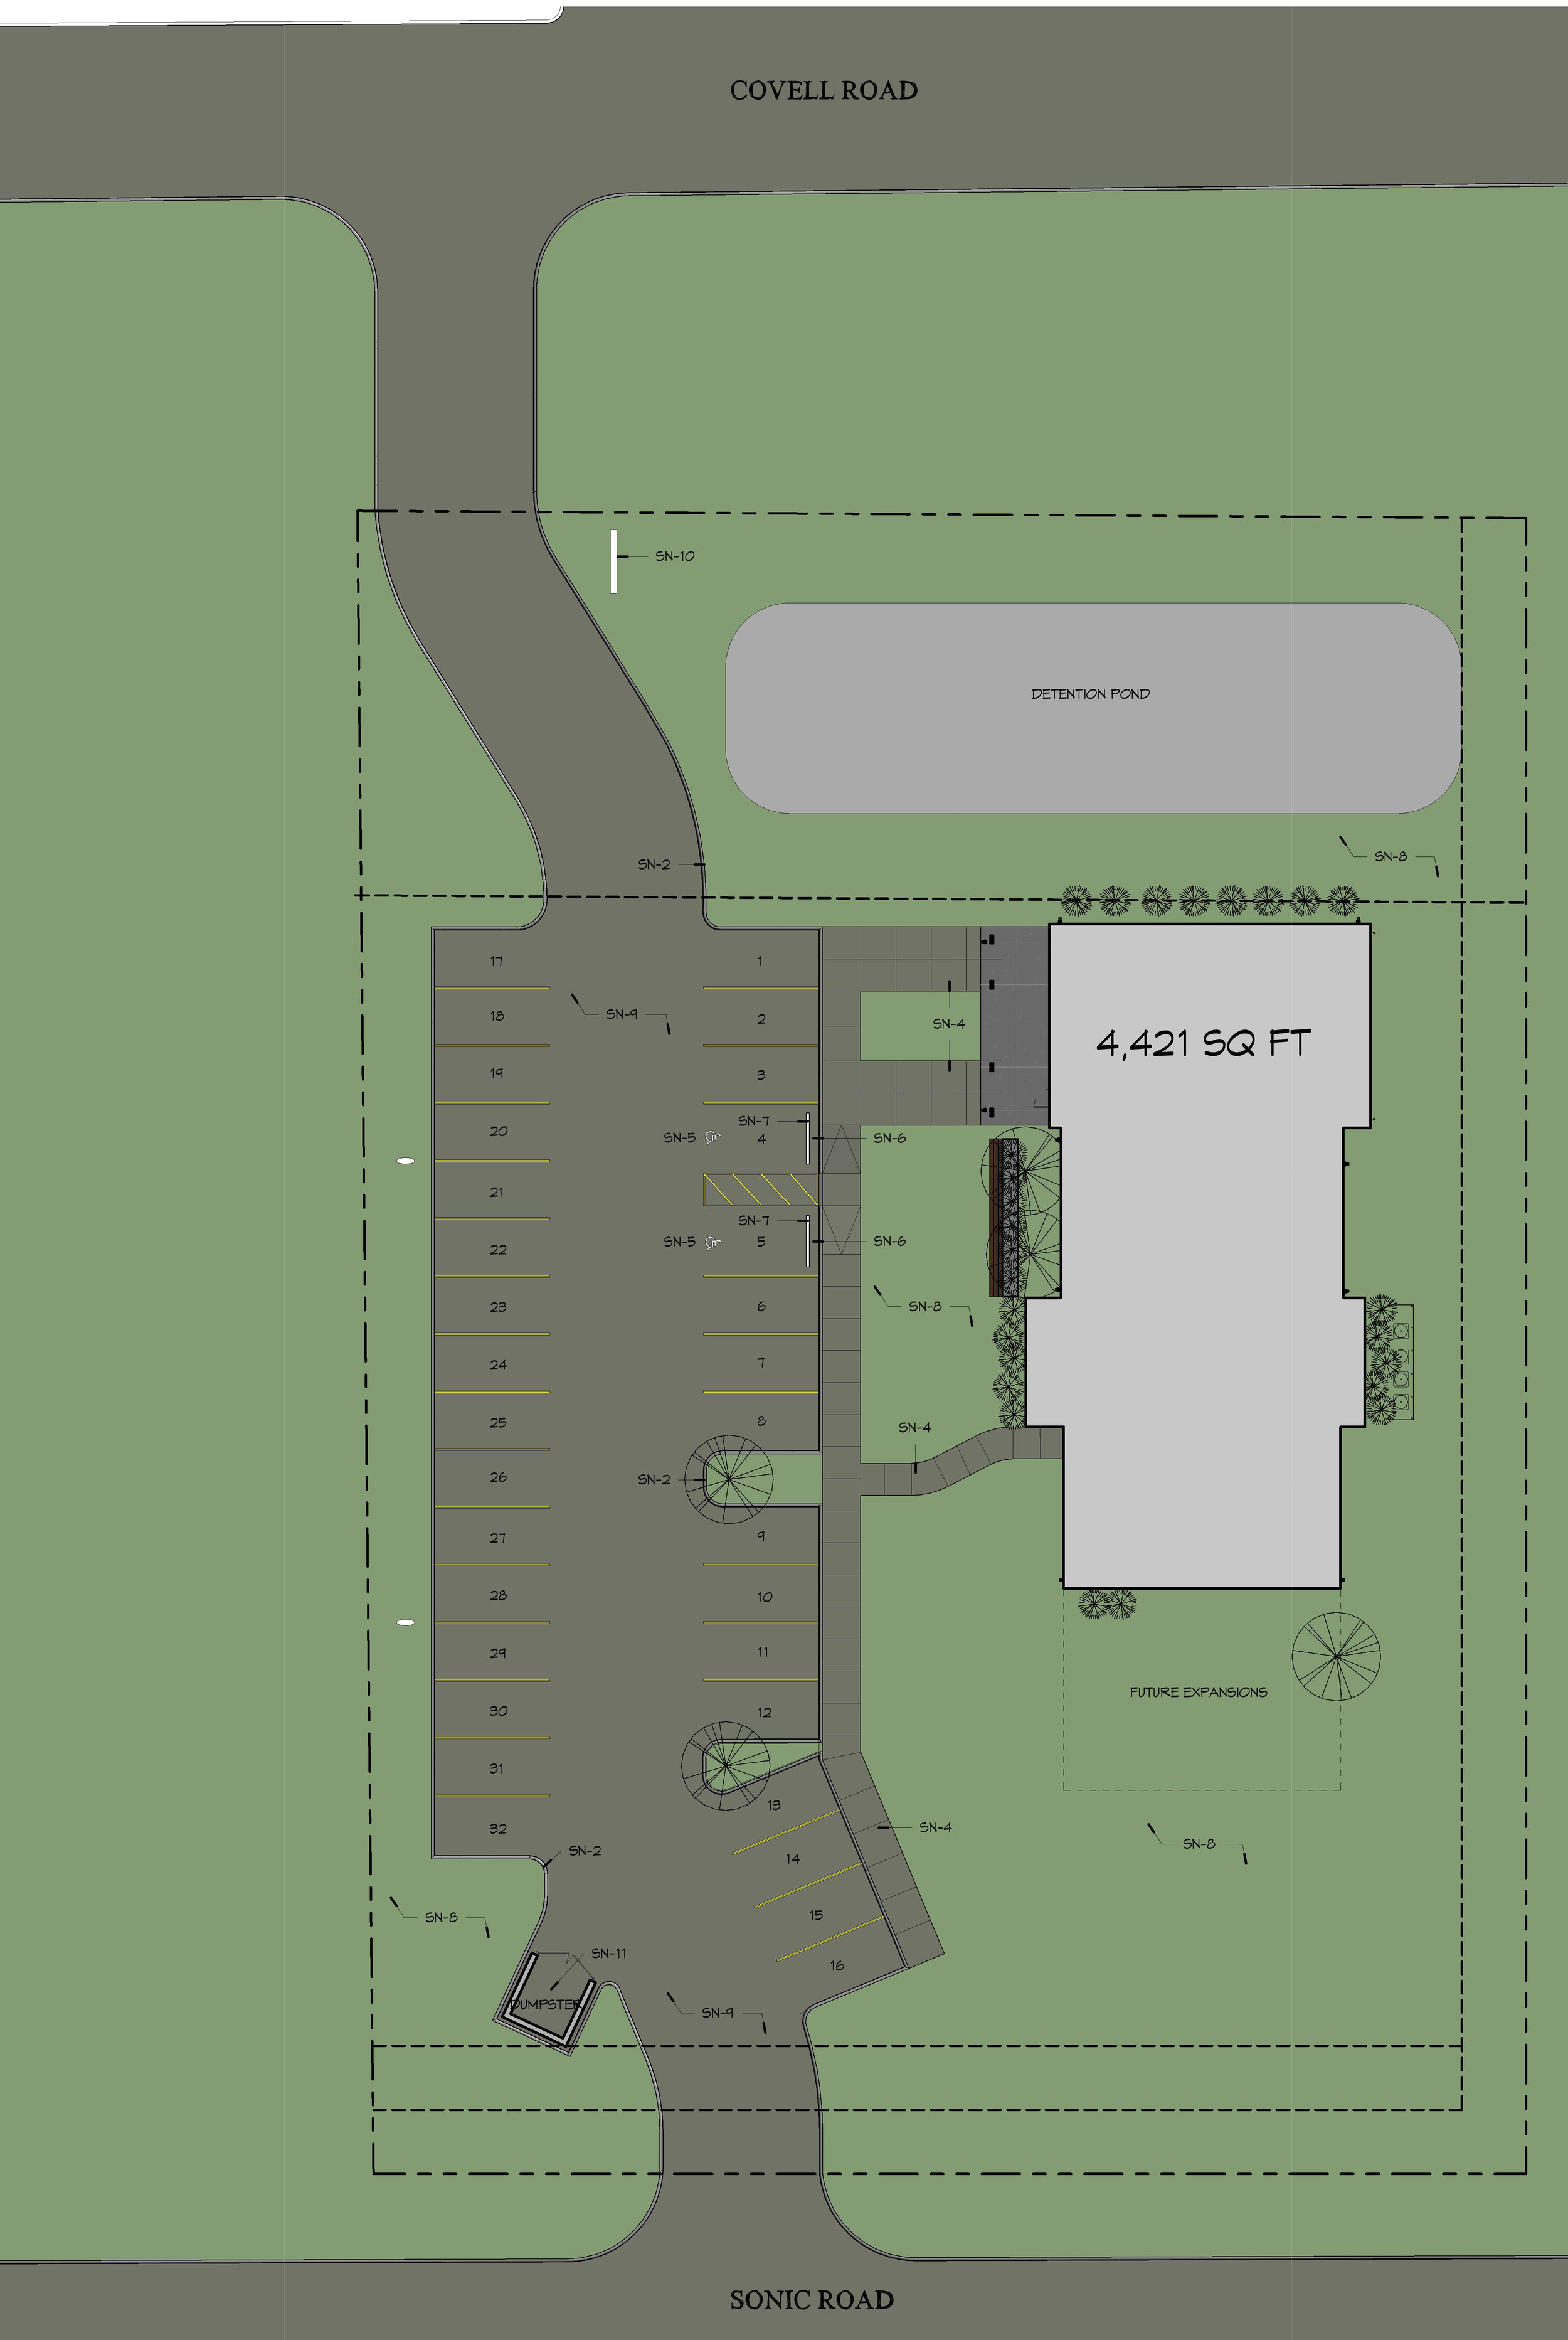 180606_McGee_Site Plan.jpg